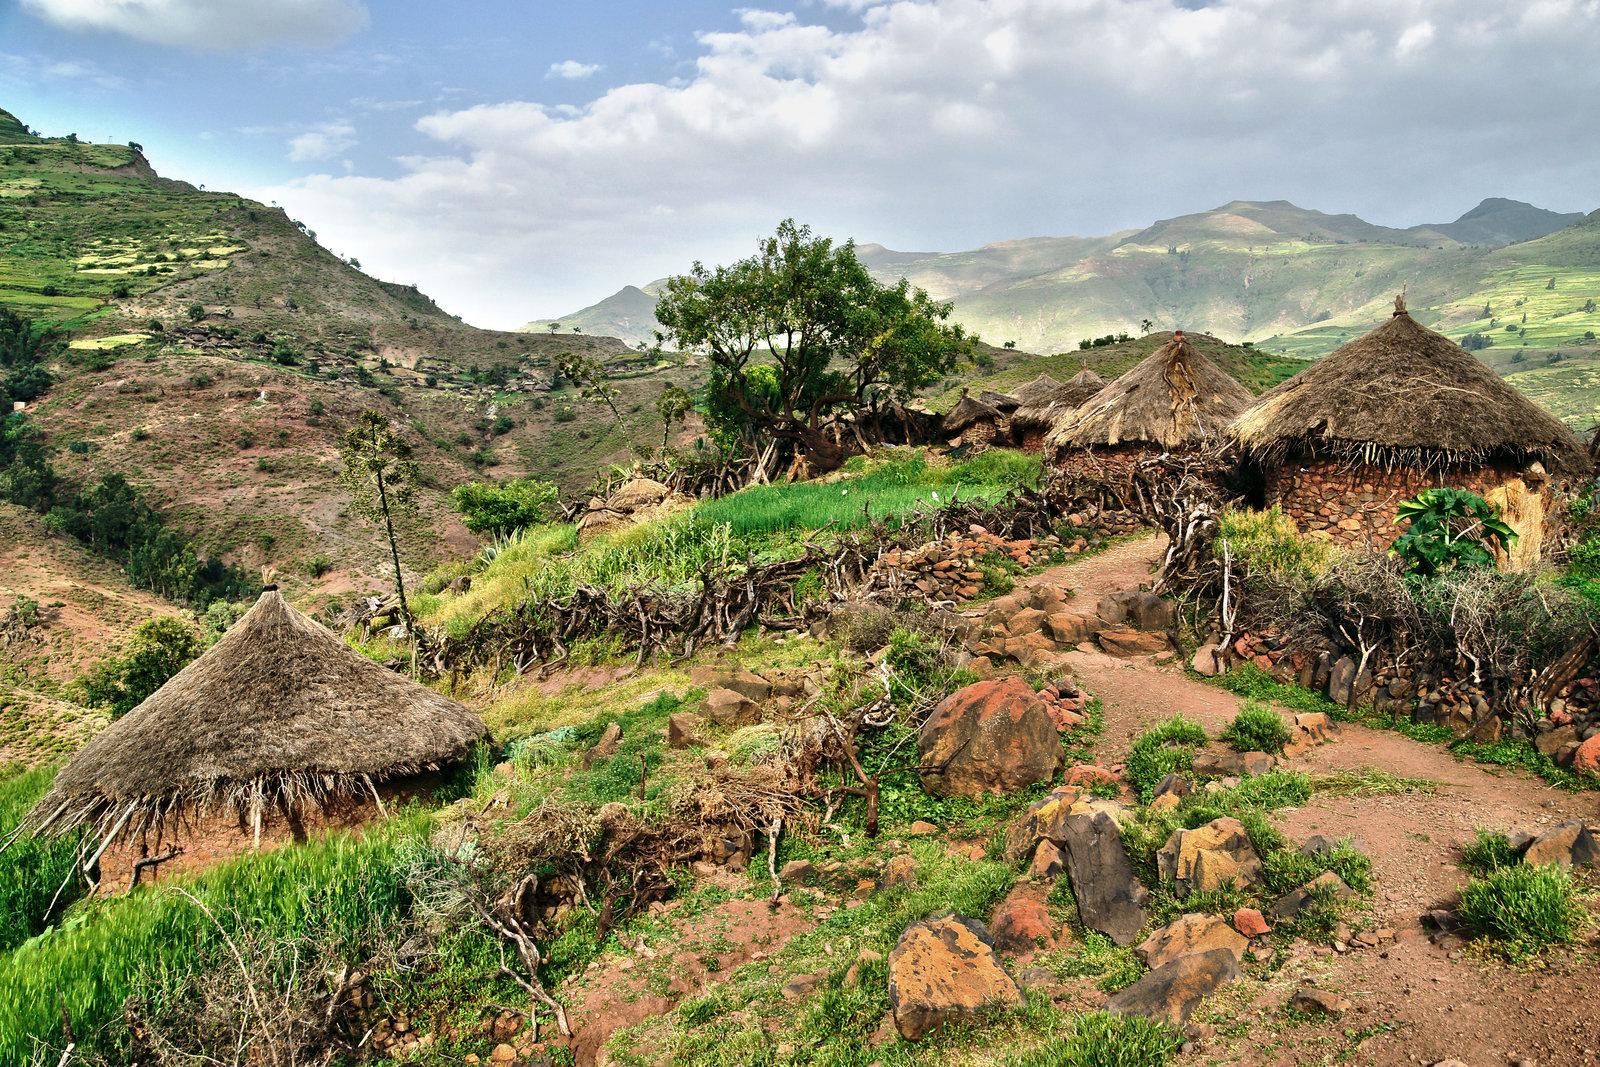 ethiopian__village_by_citizenfresh-d5h627q.jpg